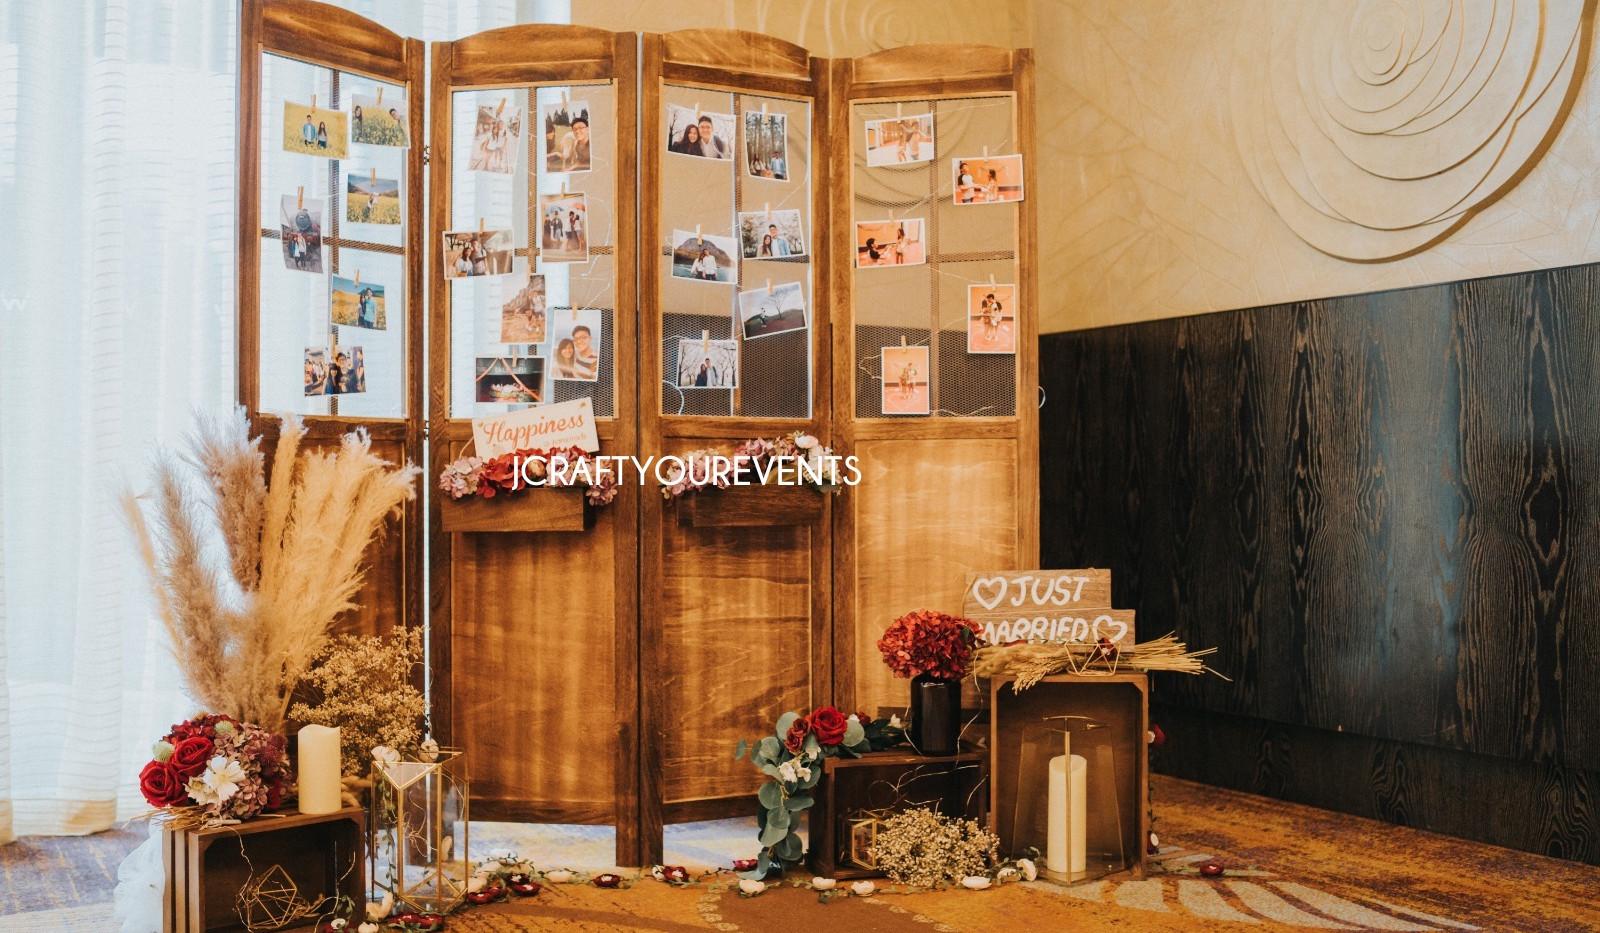 Jcraftyourevents_Premium Photo Gallery_R